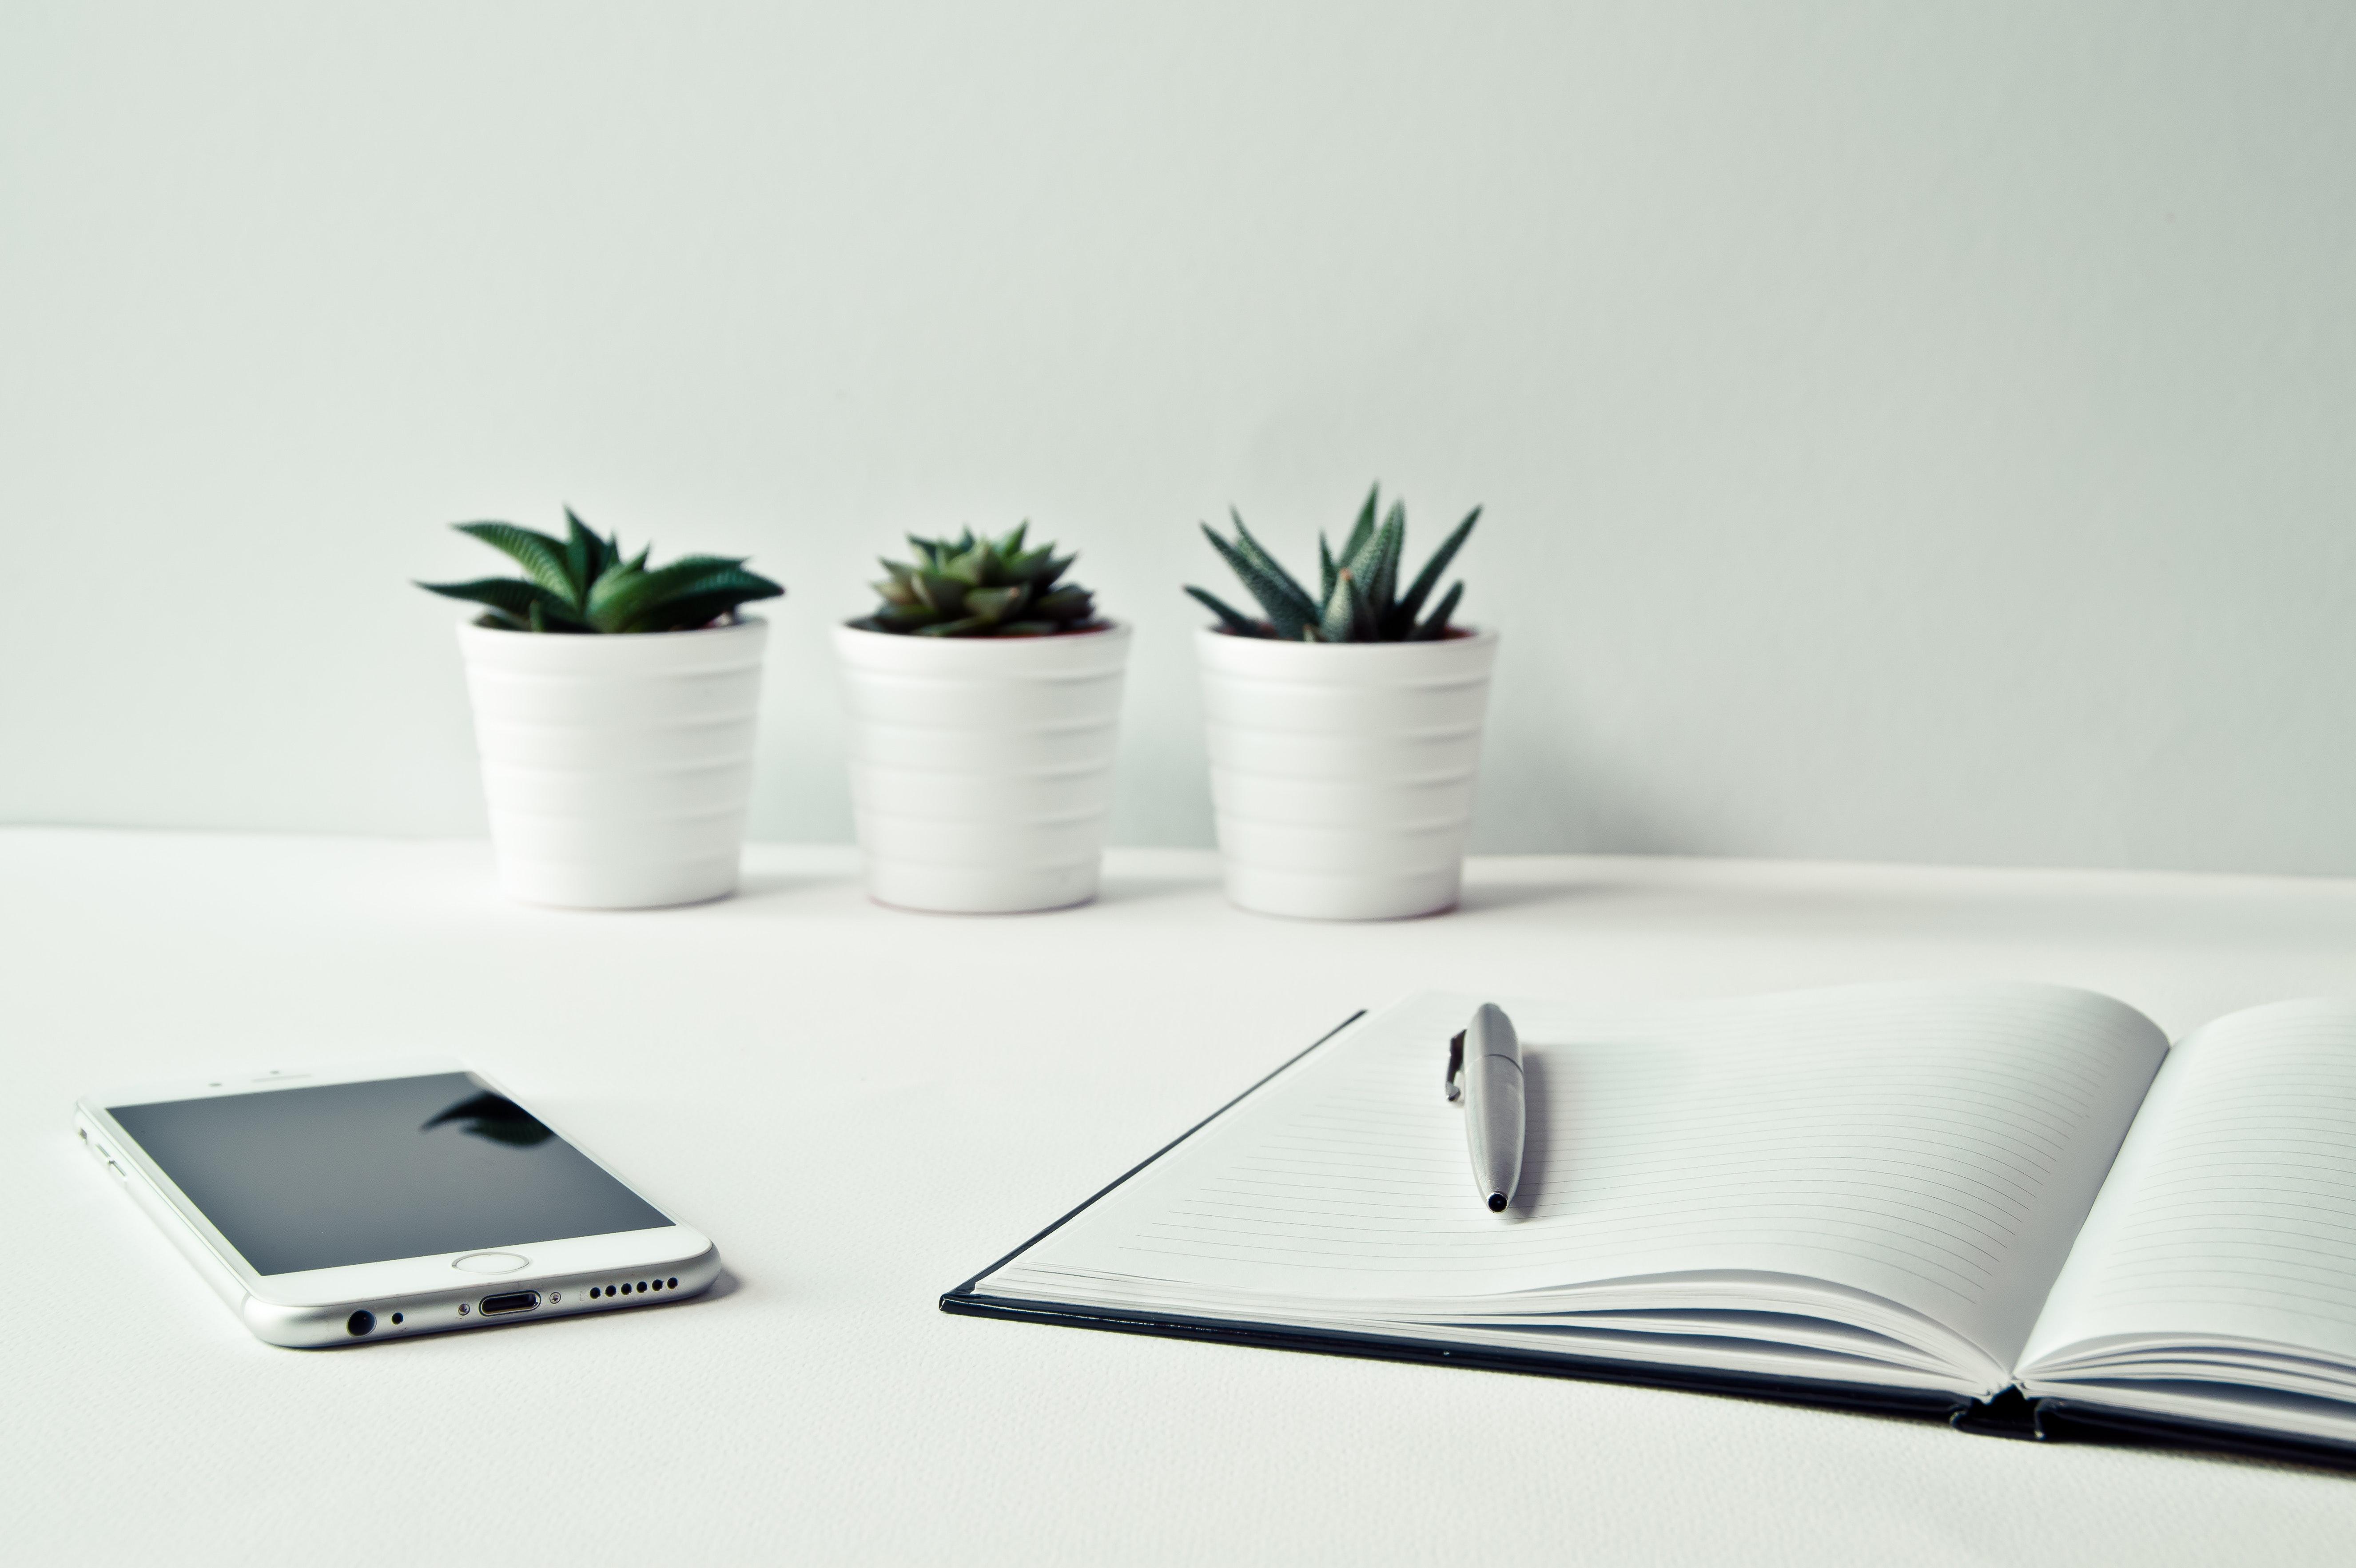 computer and three plants